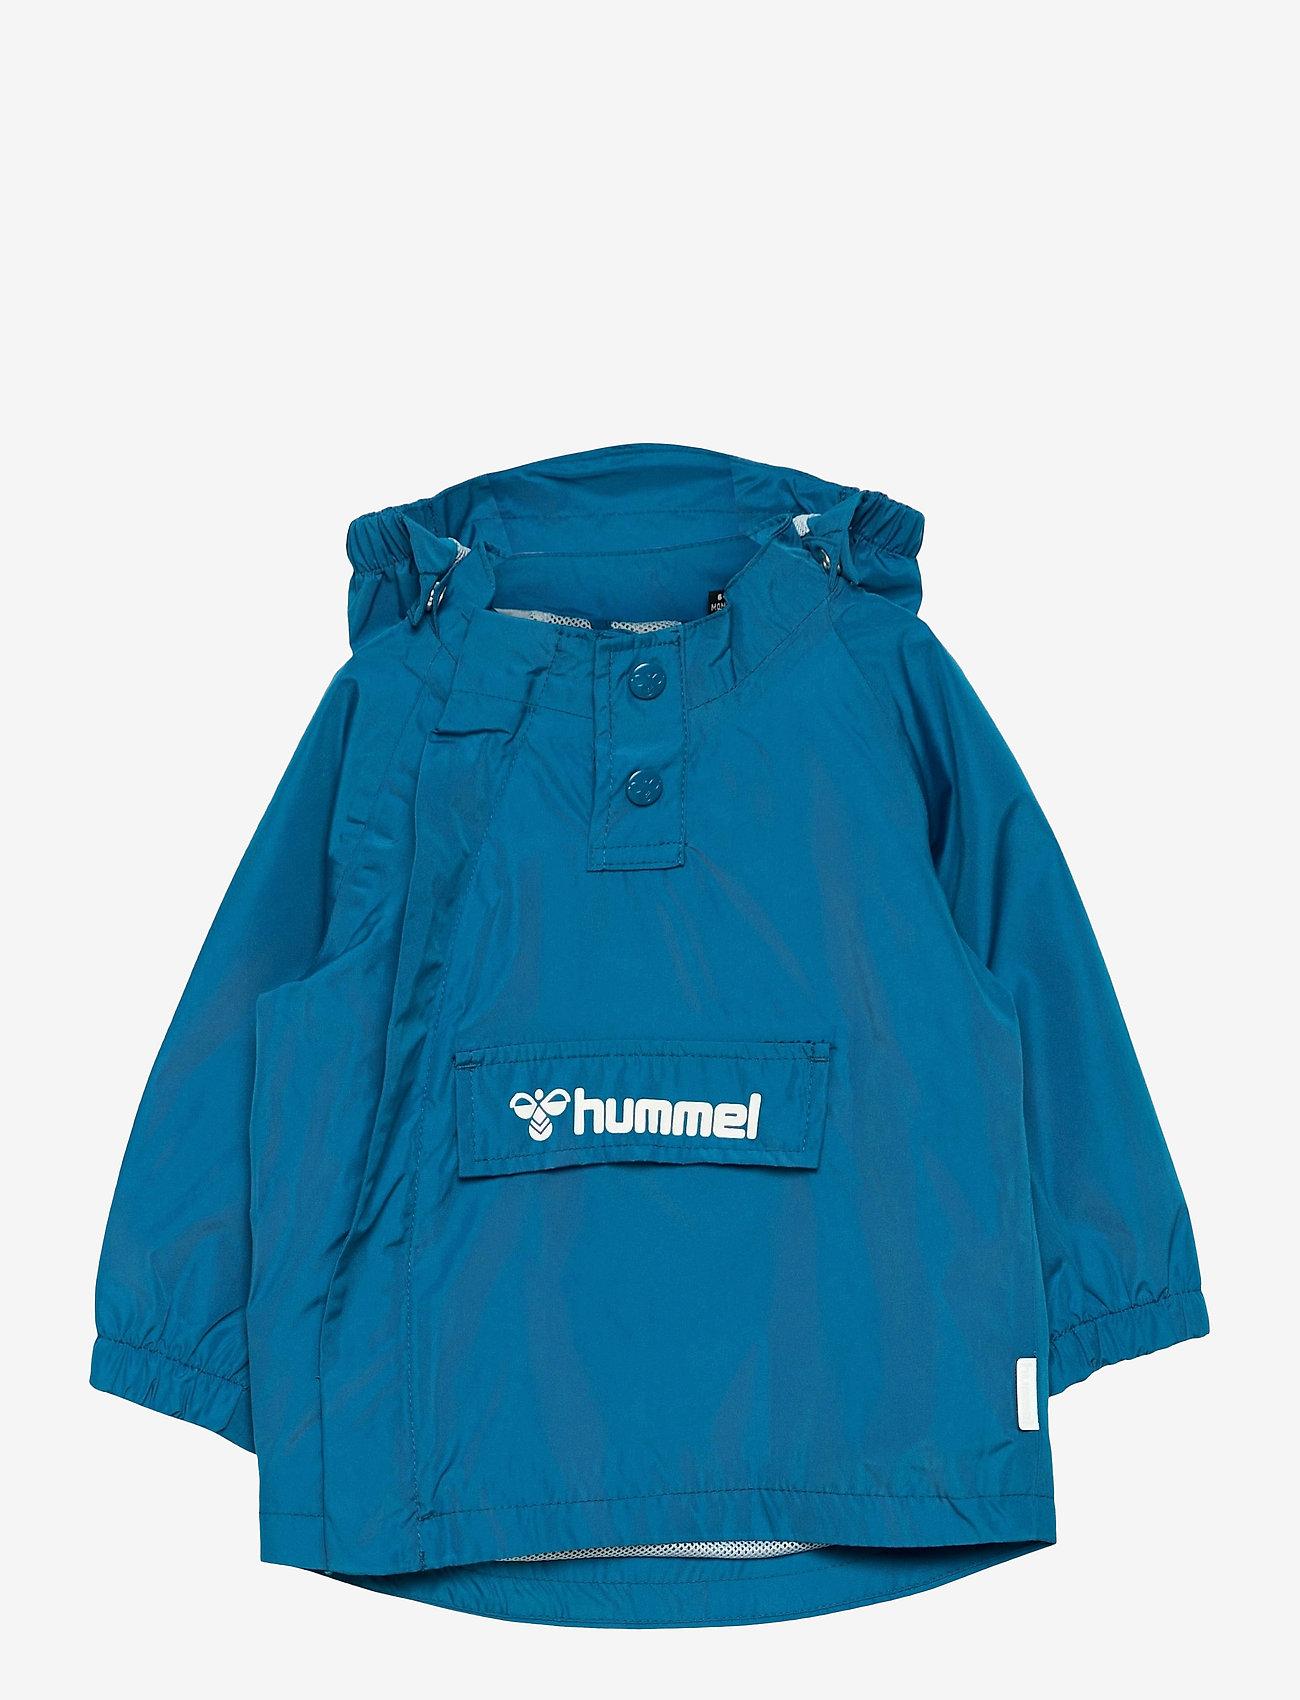 Hummel - hmlOJO JACKET - light jackets - mykonos blue - 0